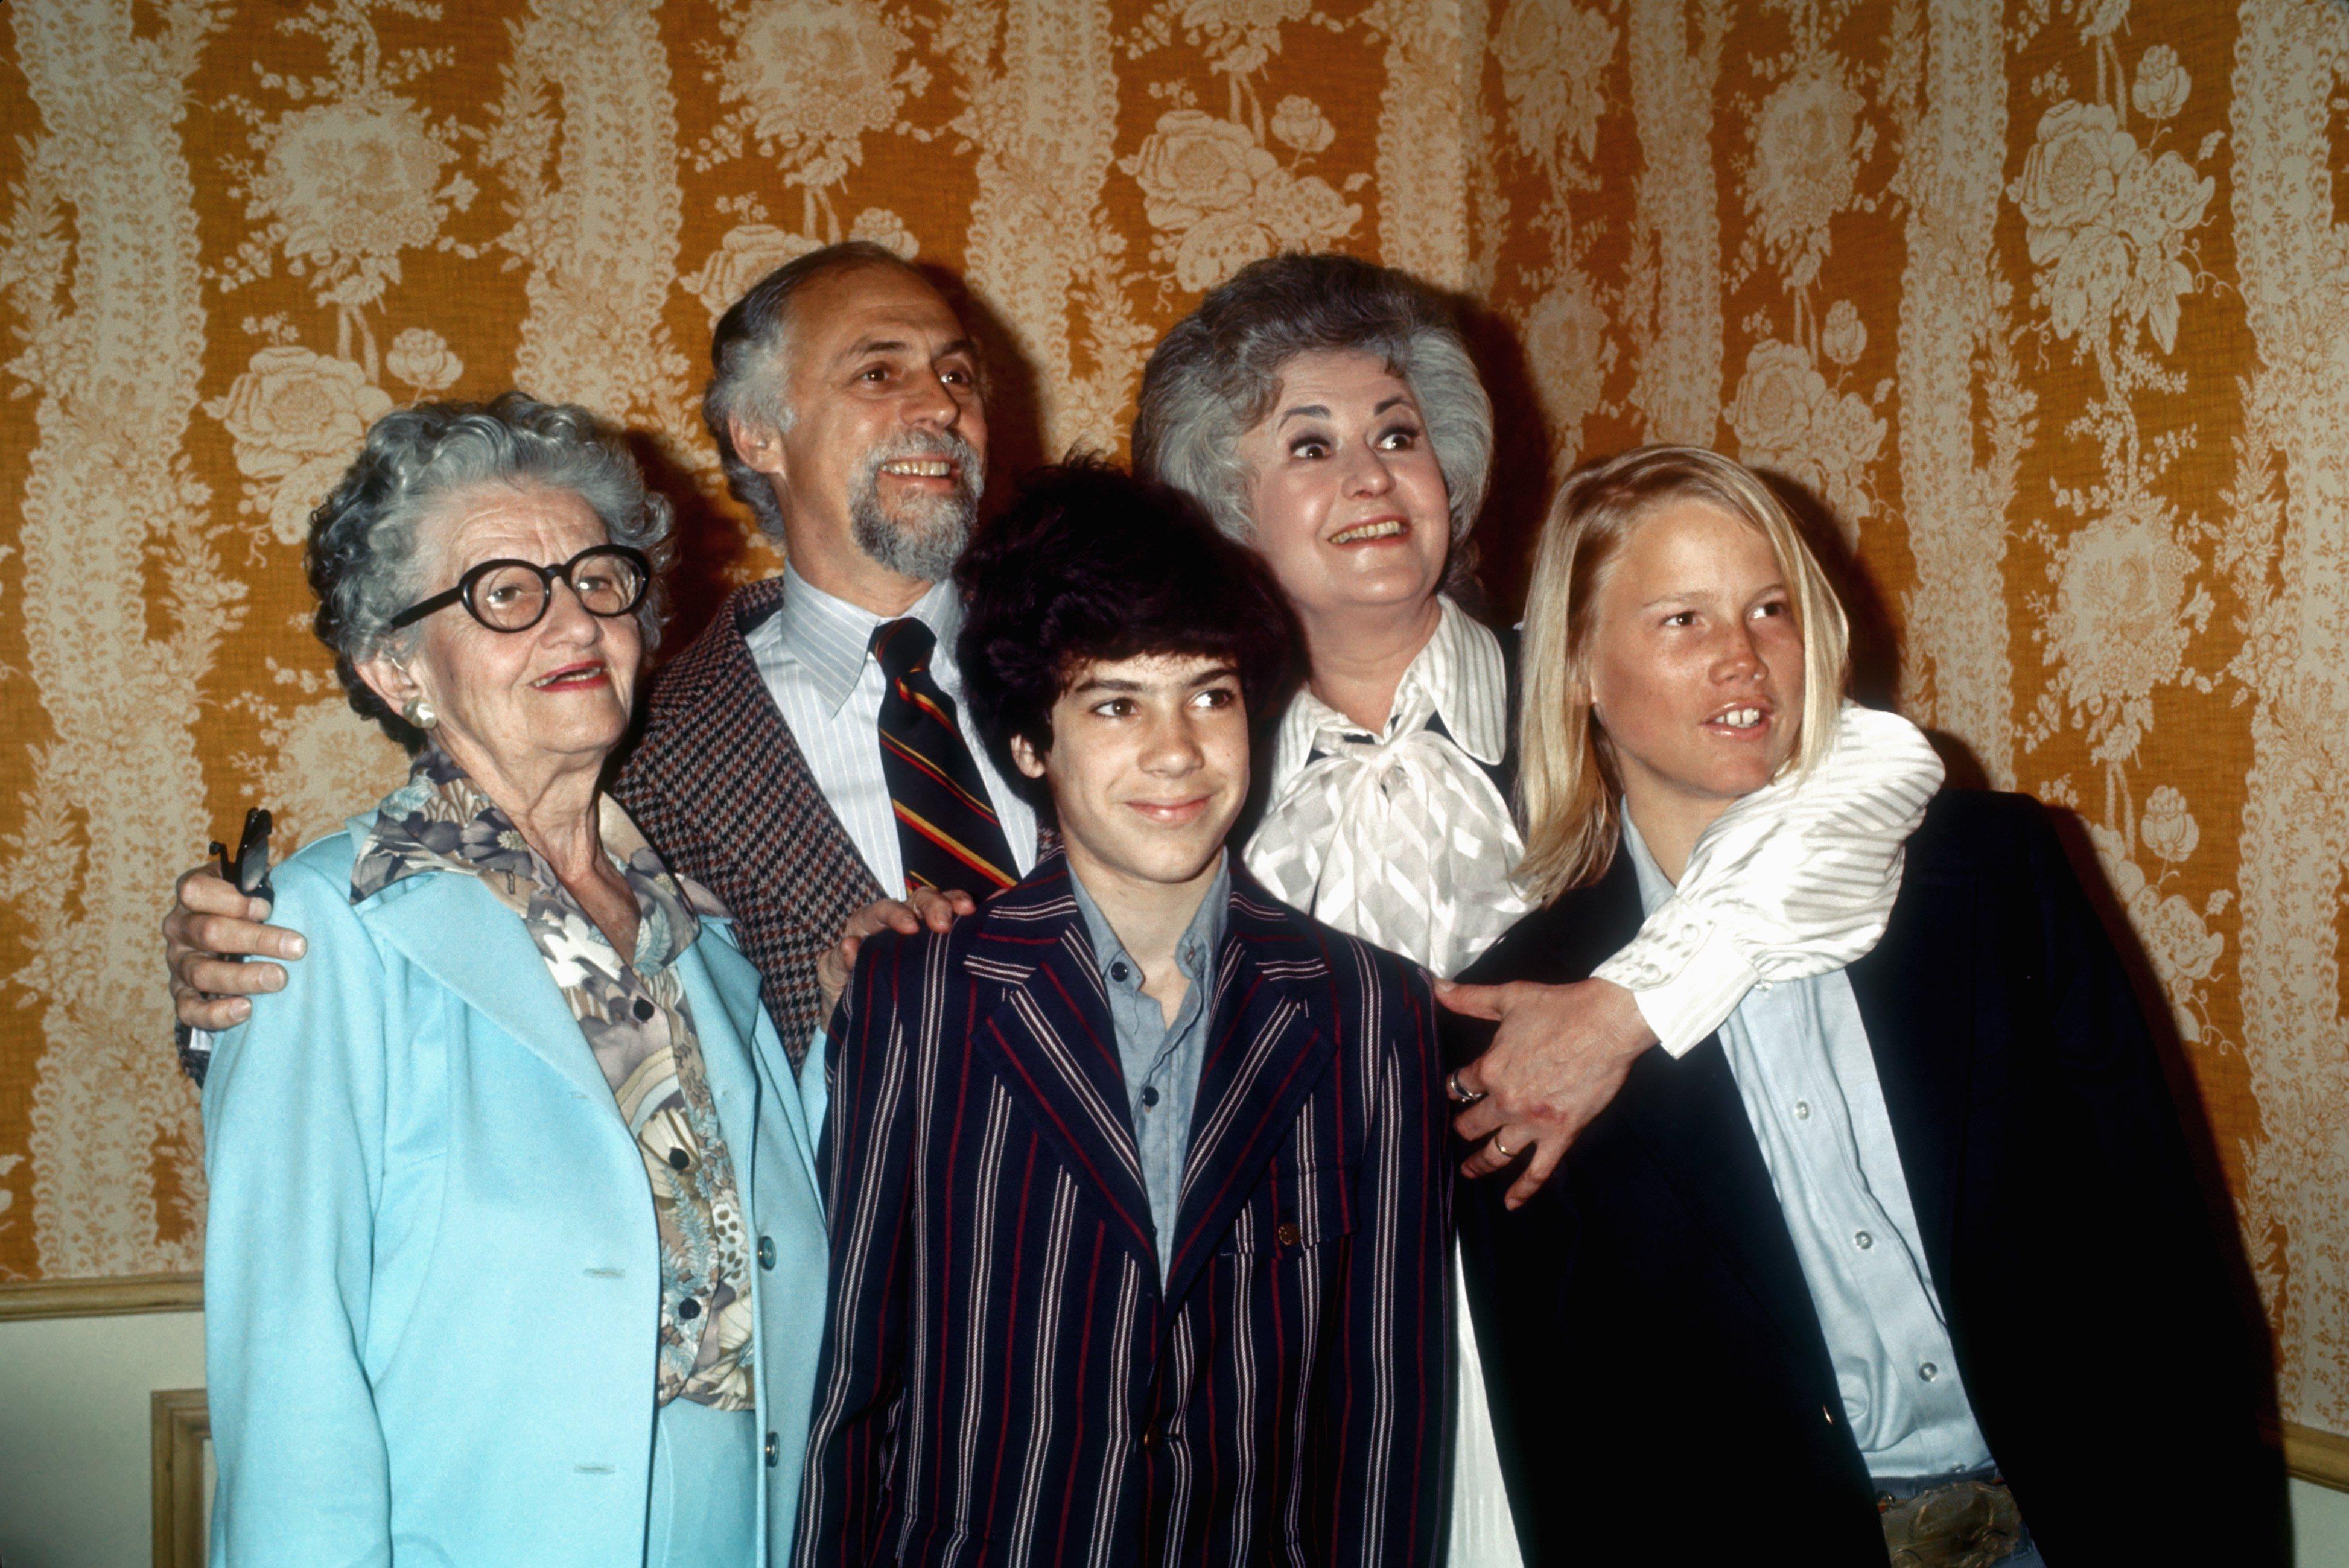 bea arthur family